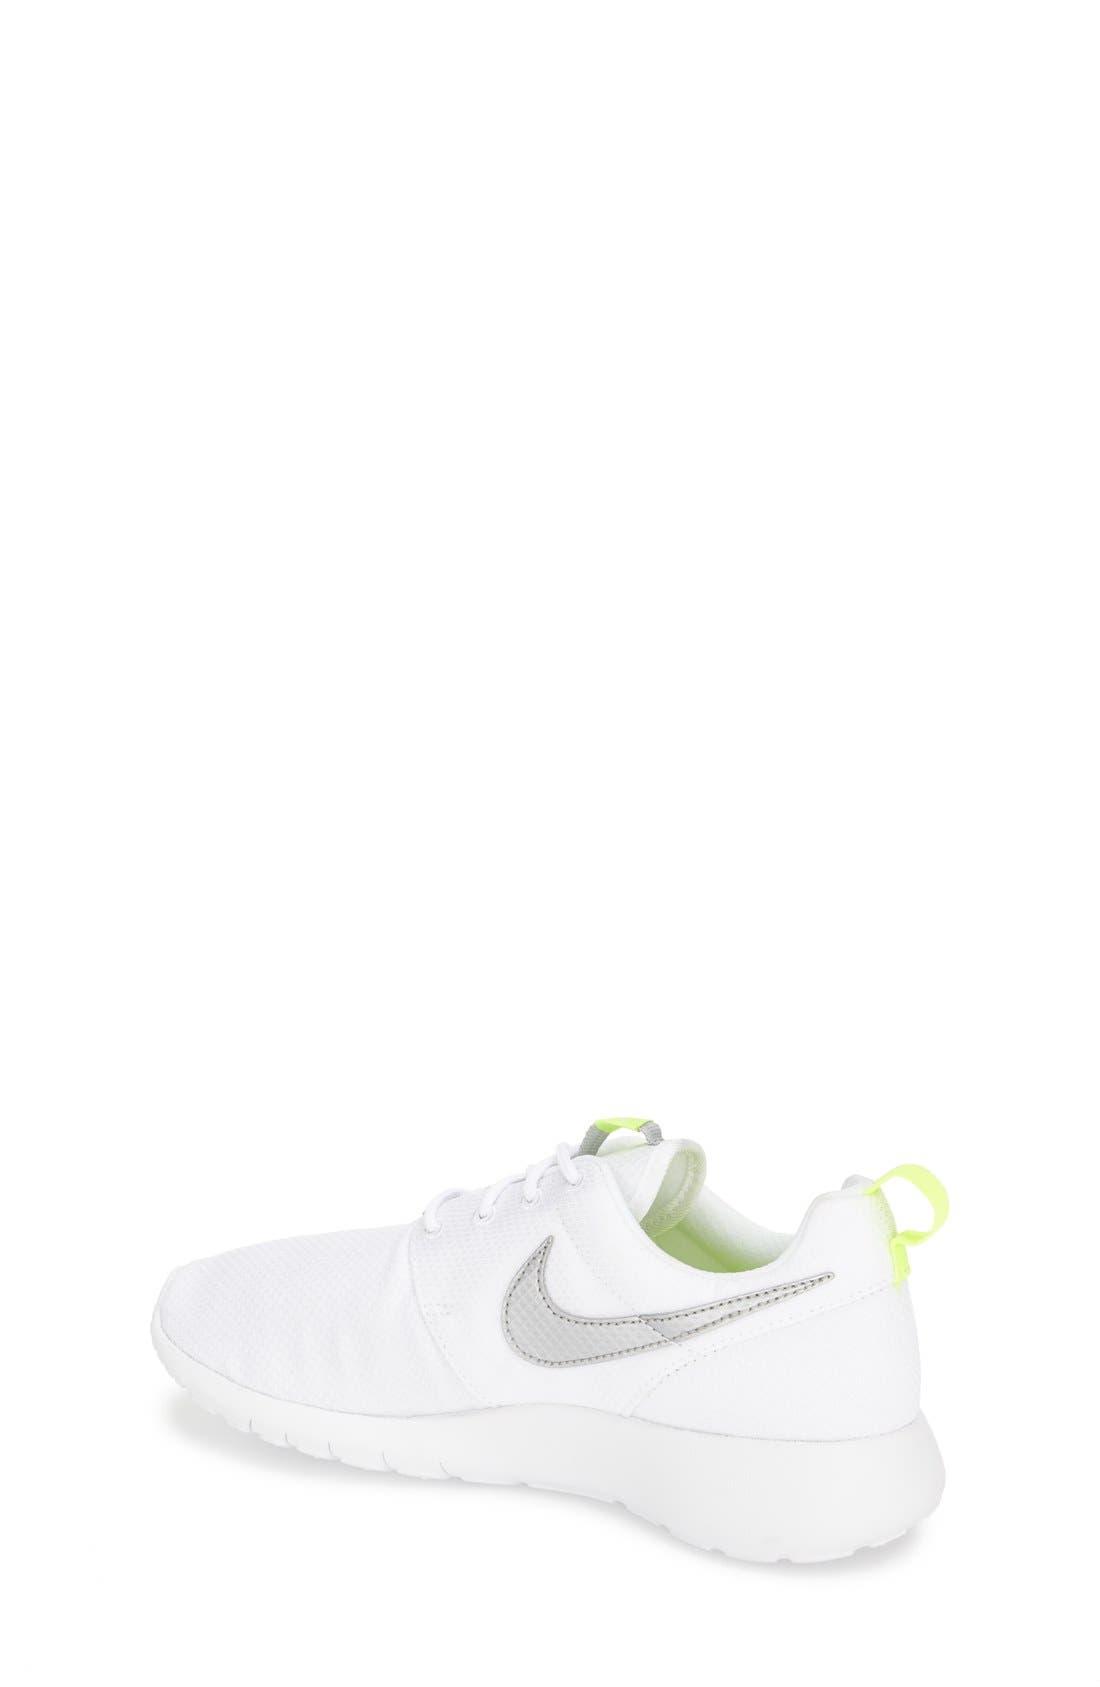 'Roshe Run' Athletic Shoe,                             Alternate thumbnail 82, color,